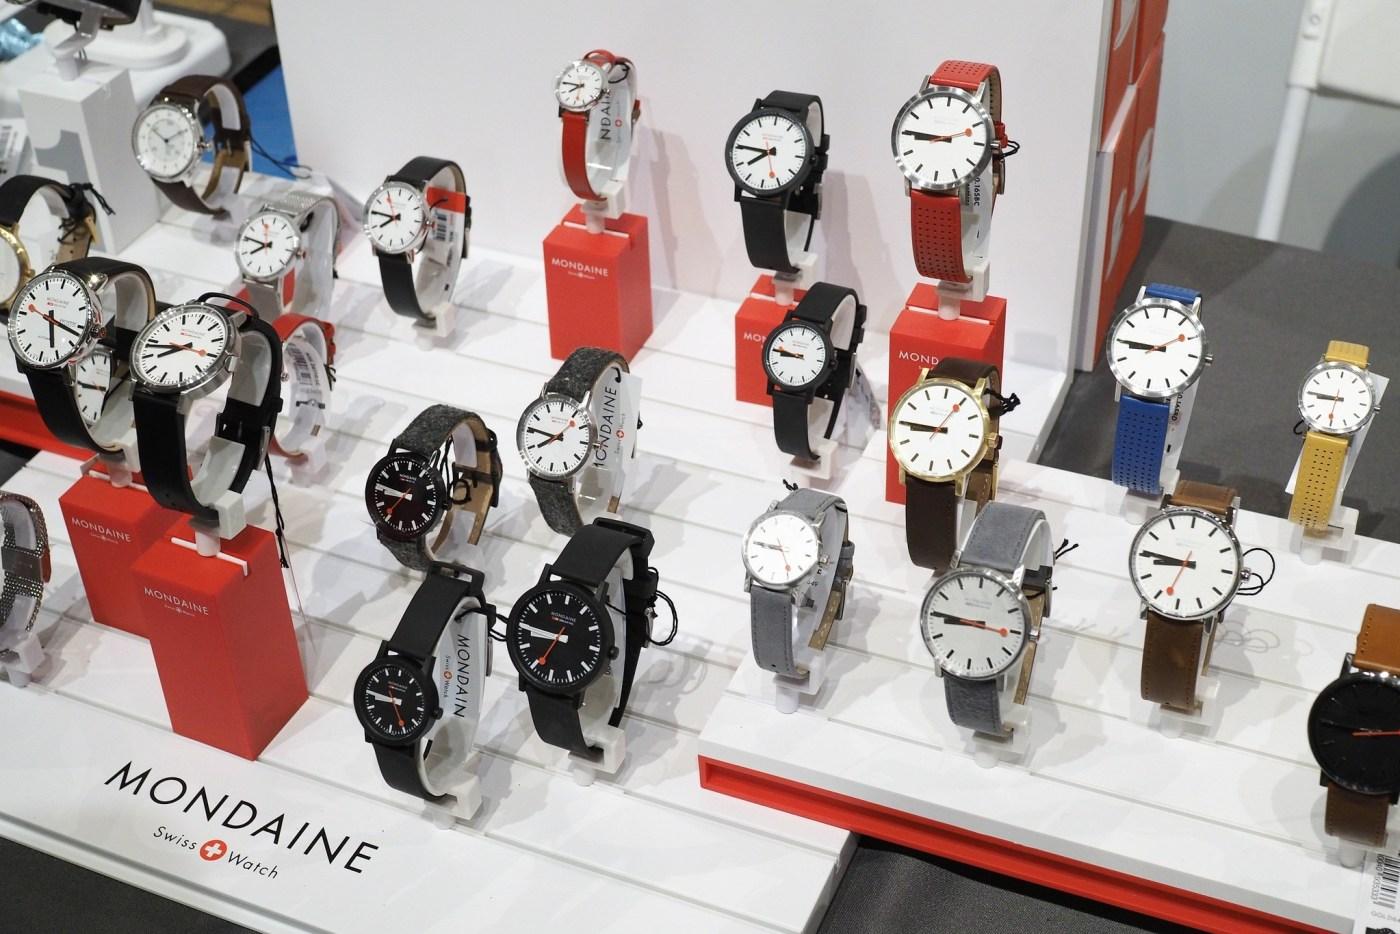 Mondaine watch display